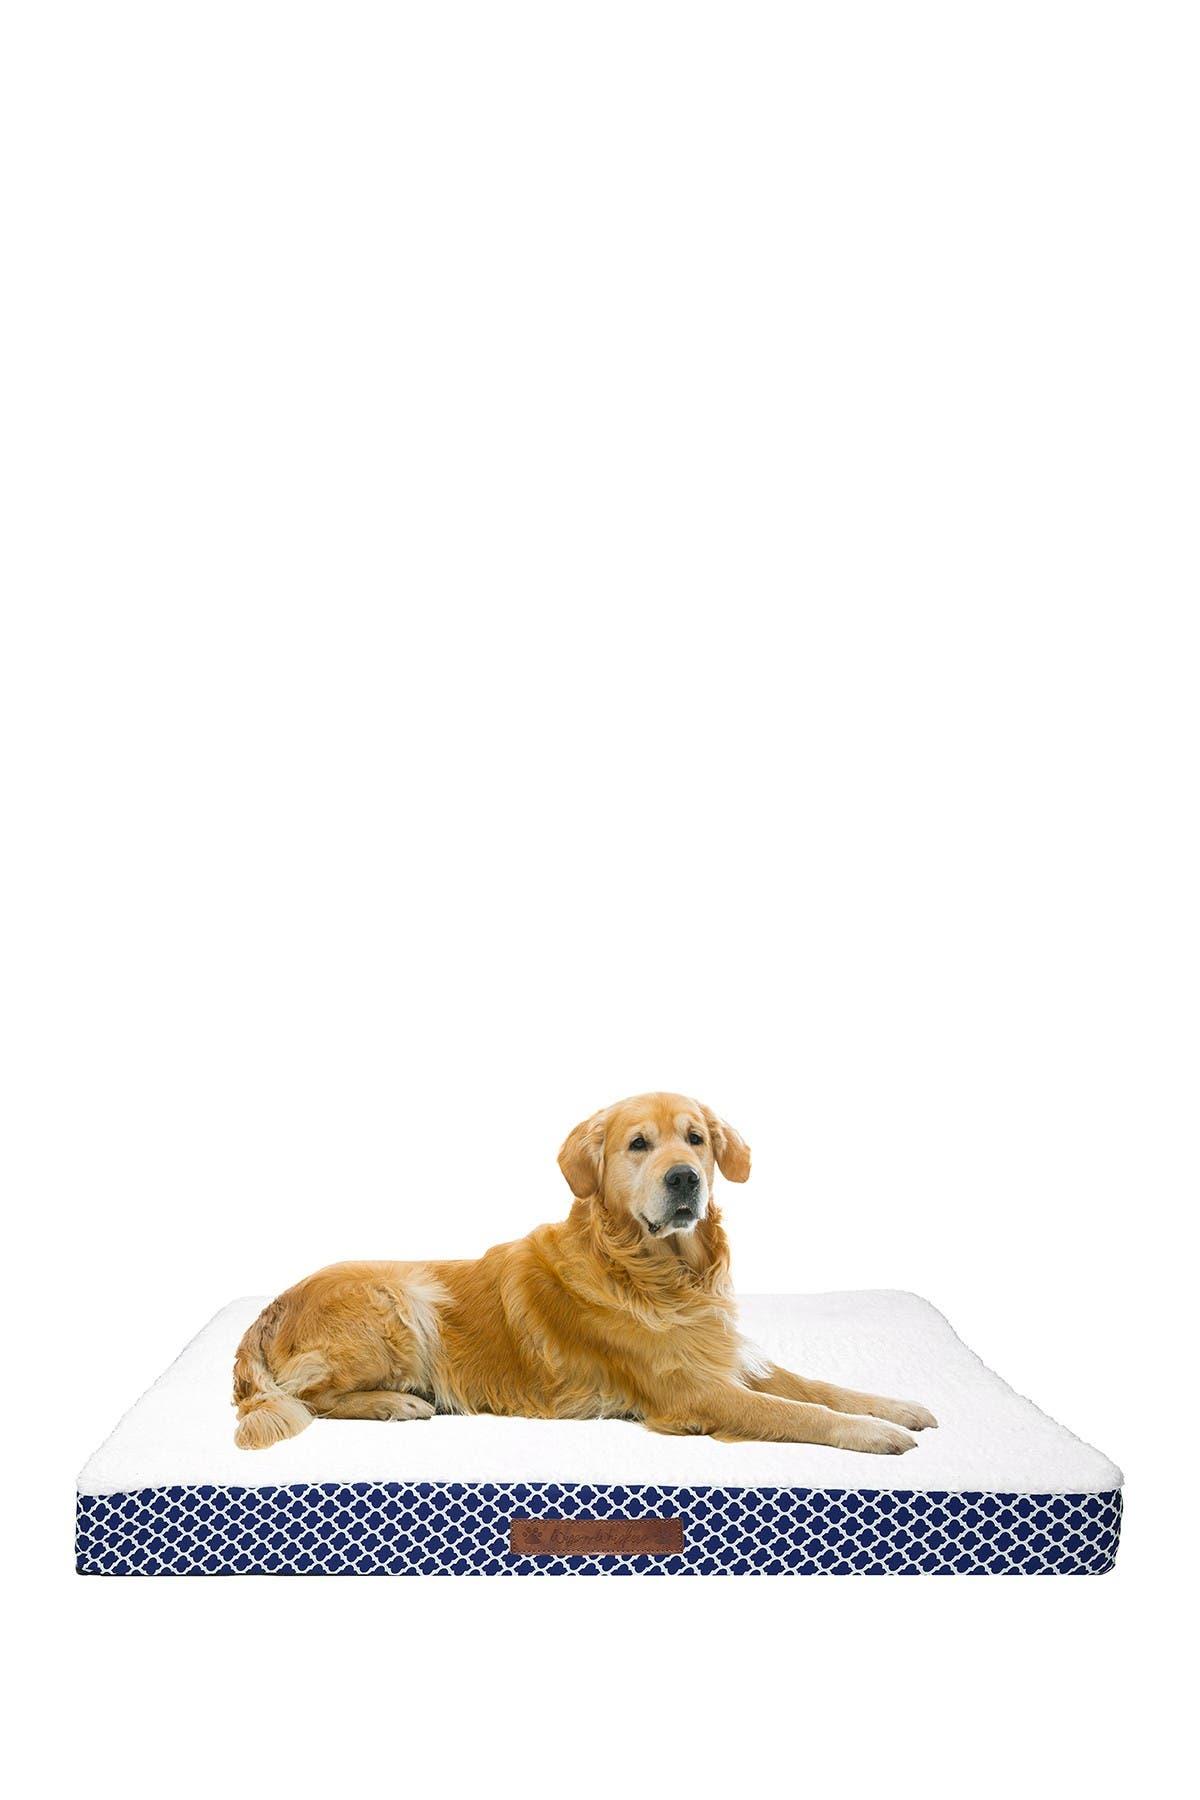 Image of Duck River Textile Cezebel Trellis Jumbo Orthopedic Memory Foam Pet Bed